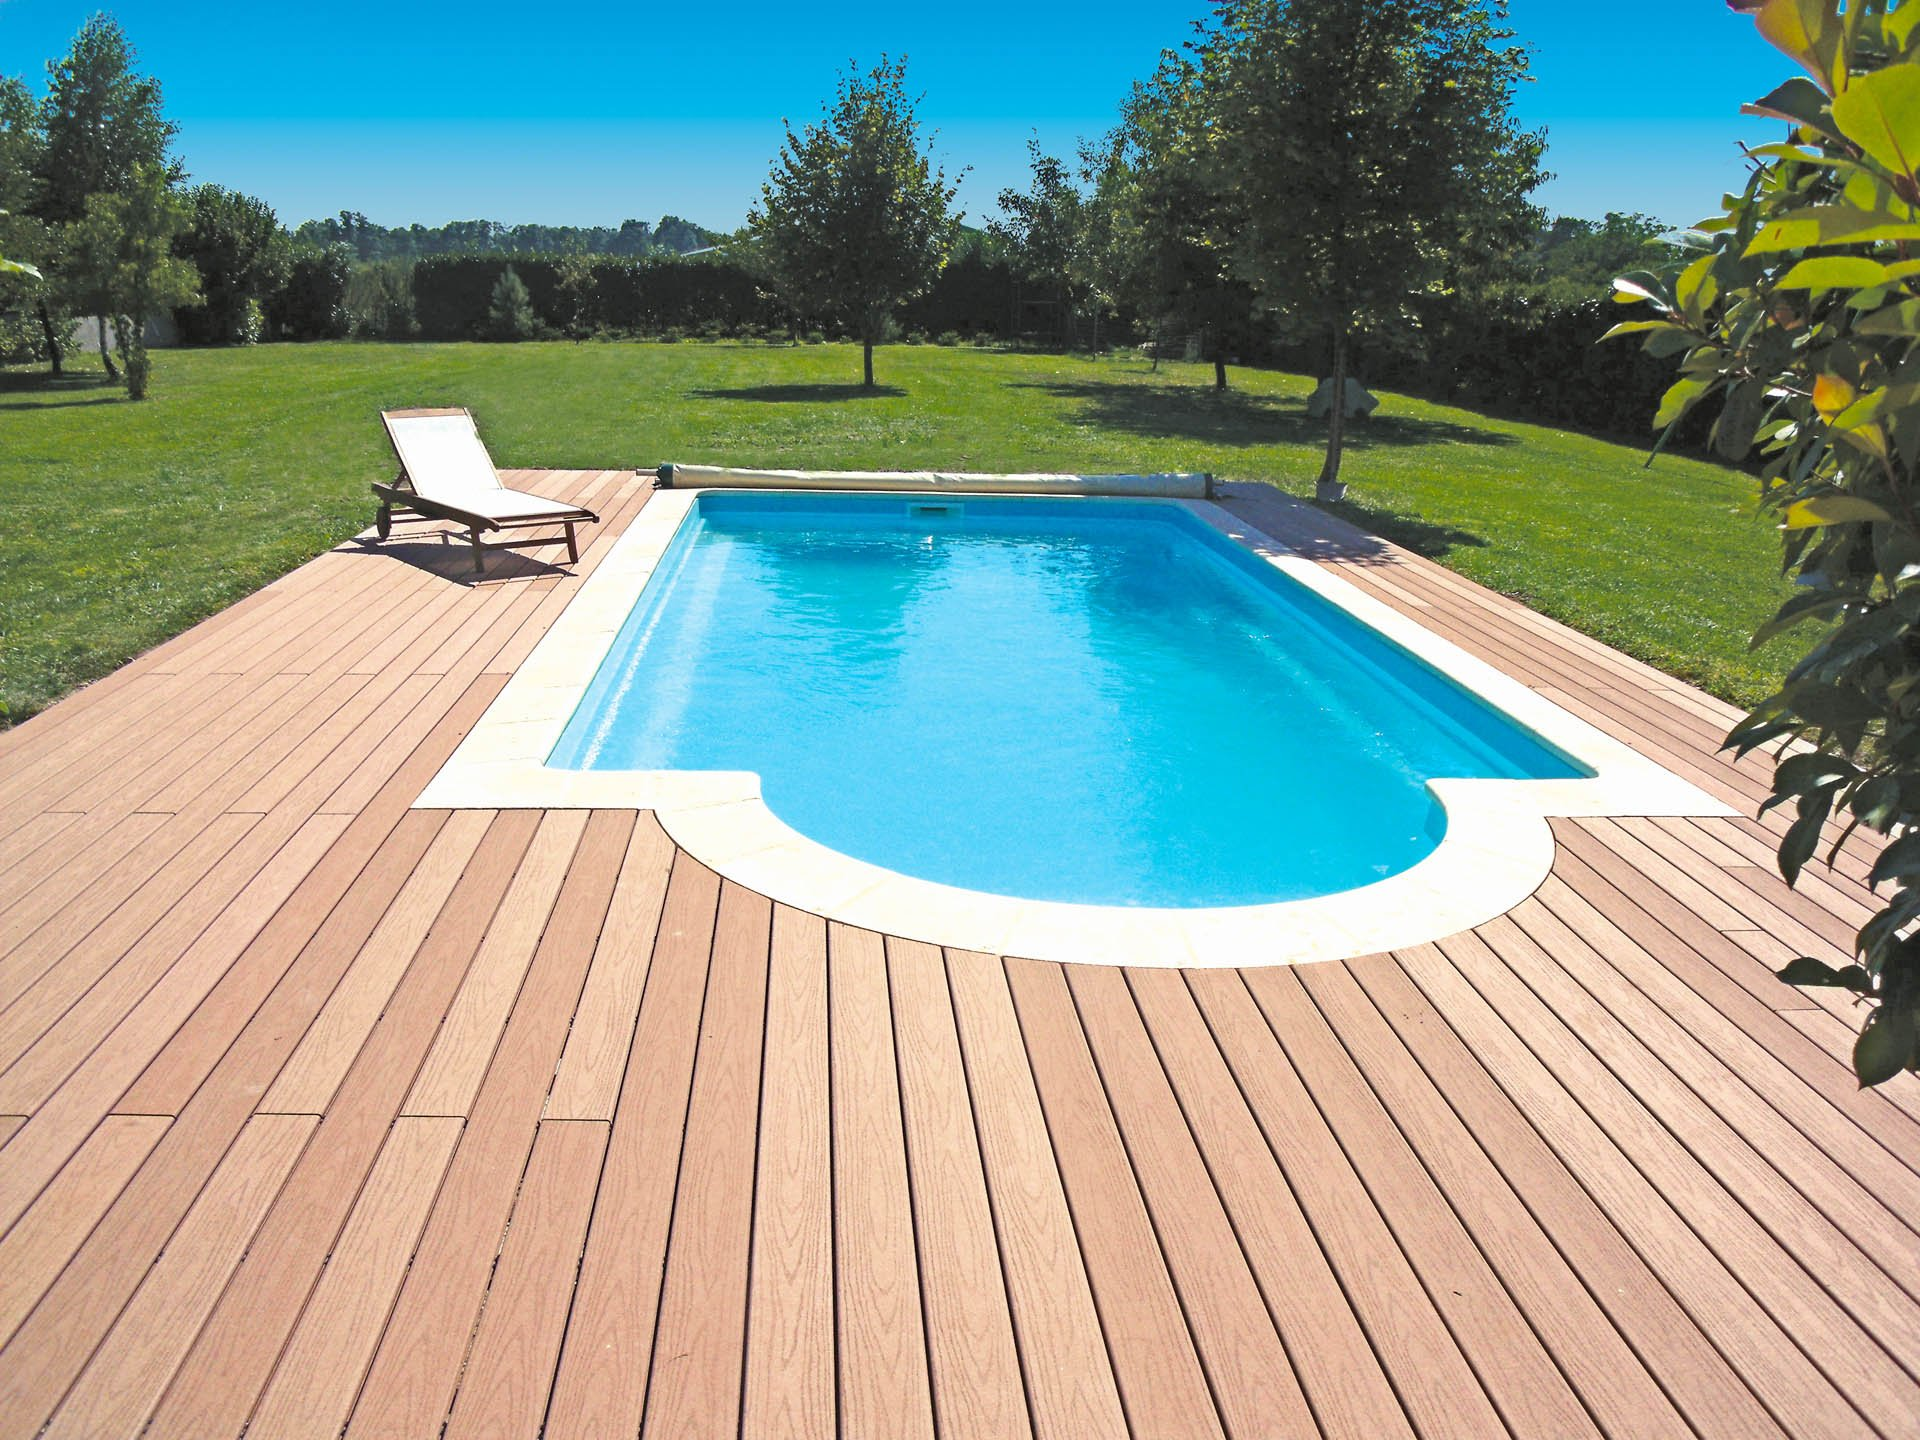 piscine coque polyester forme rectangulaire 8 50x4 a fond plat caraiba 3 piscines ibiza